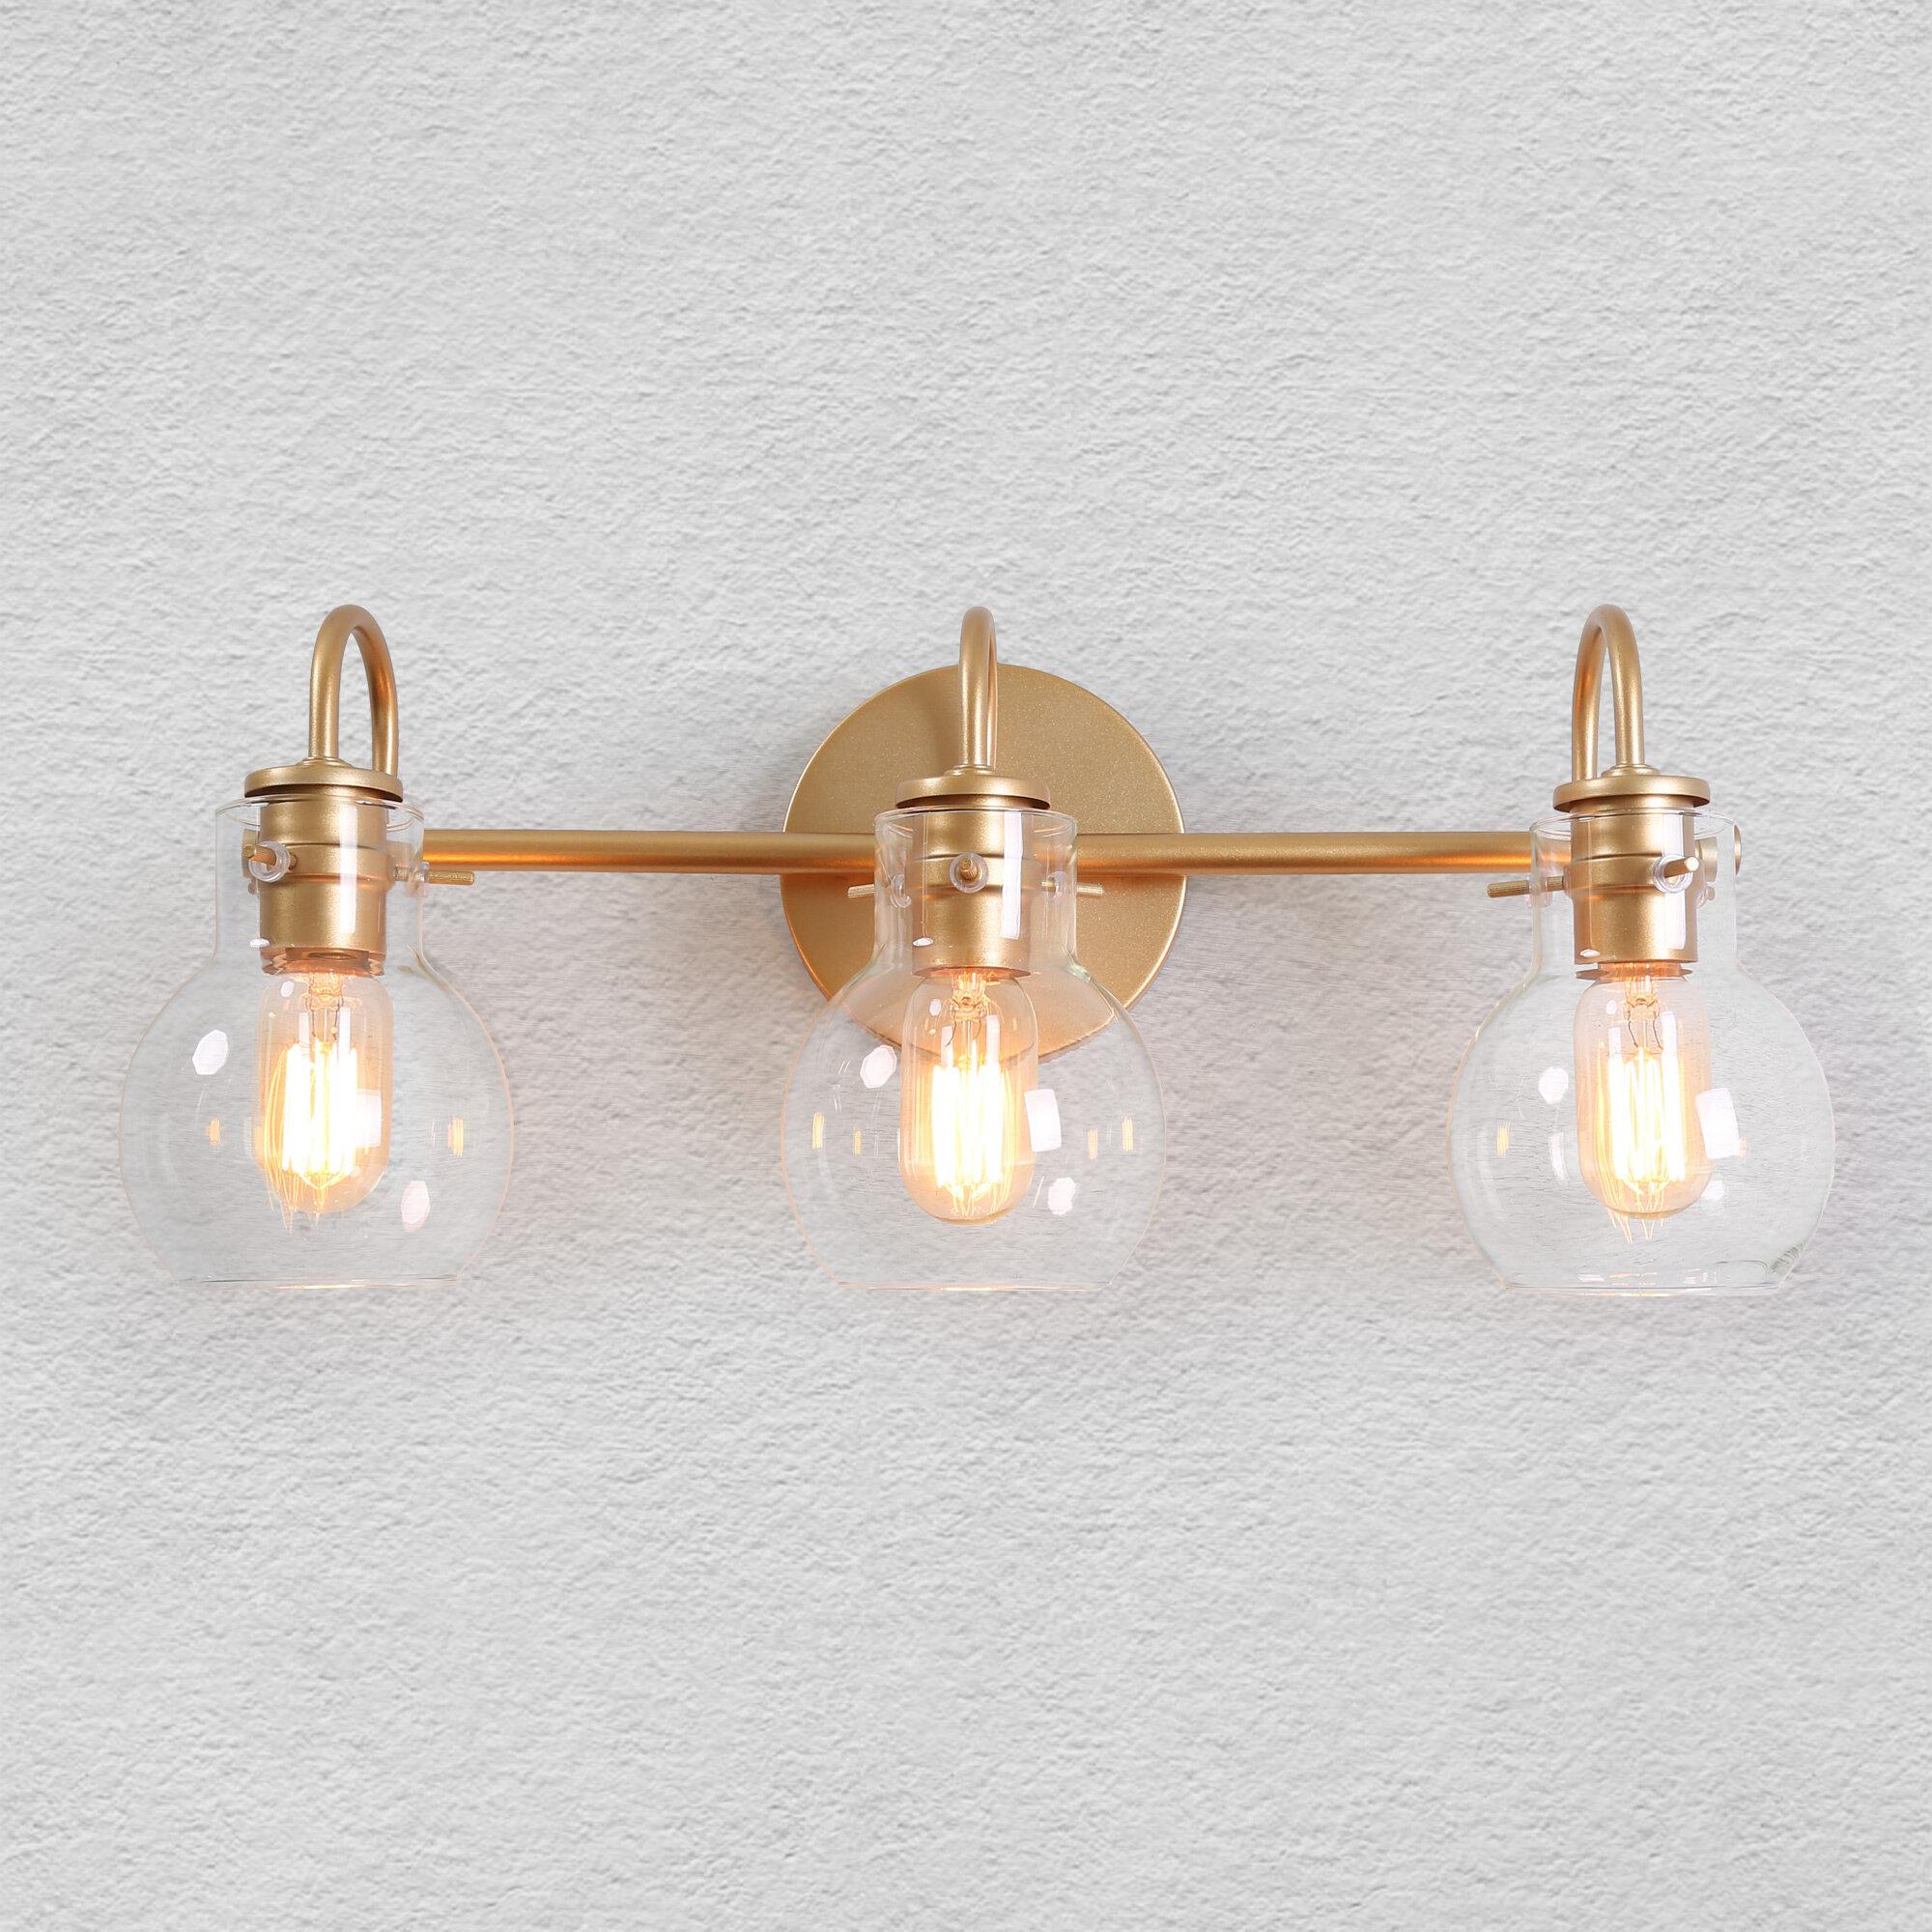 Mercer41 Aikens 3 Light Vanity Light Reviews Wayfair